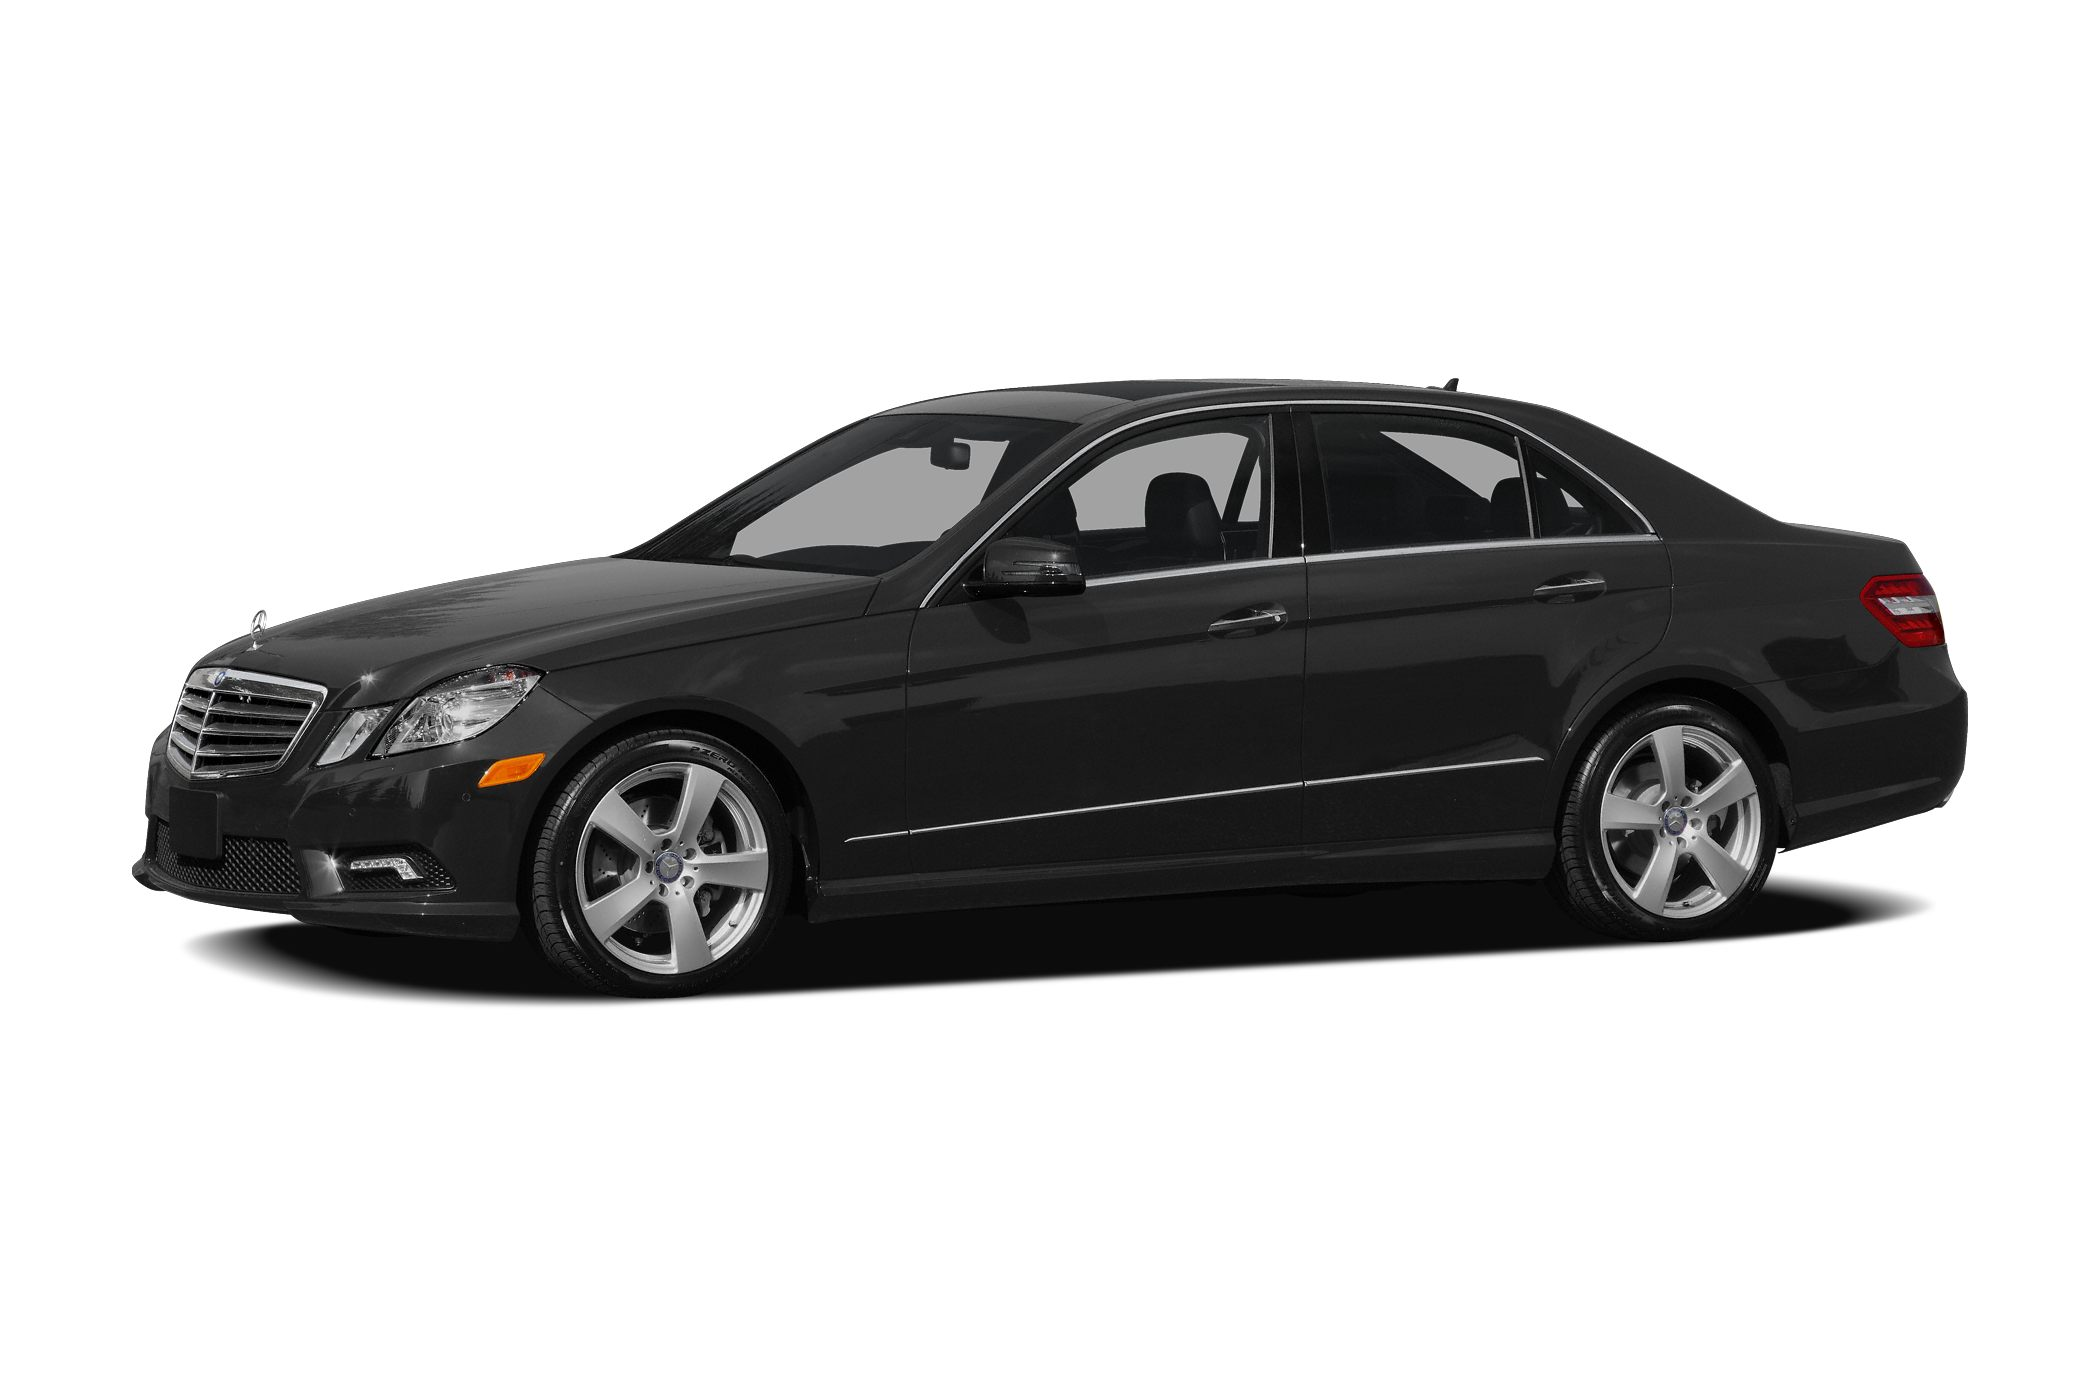 2010 Mercedes Benz E Class Safety Recalls